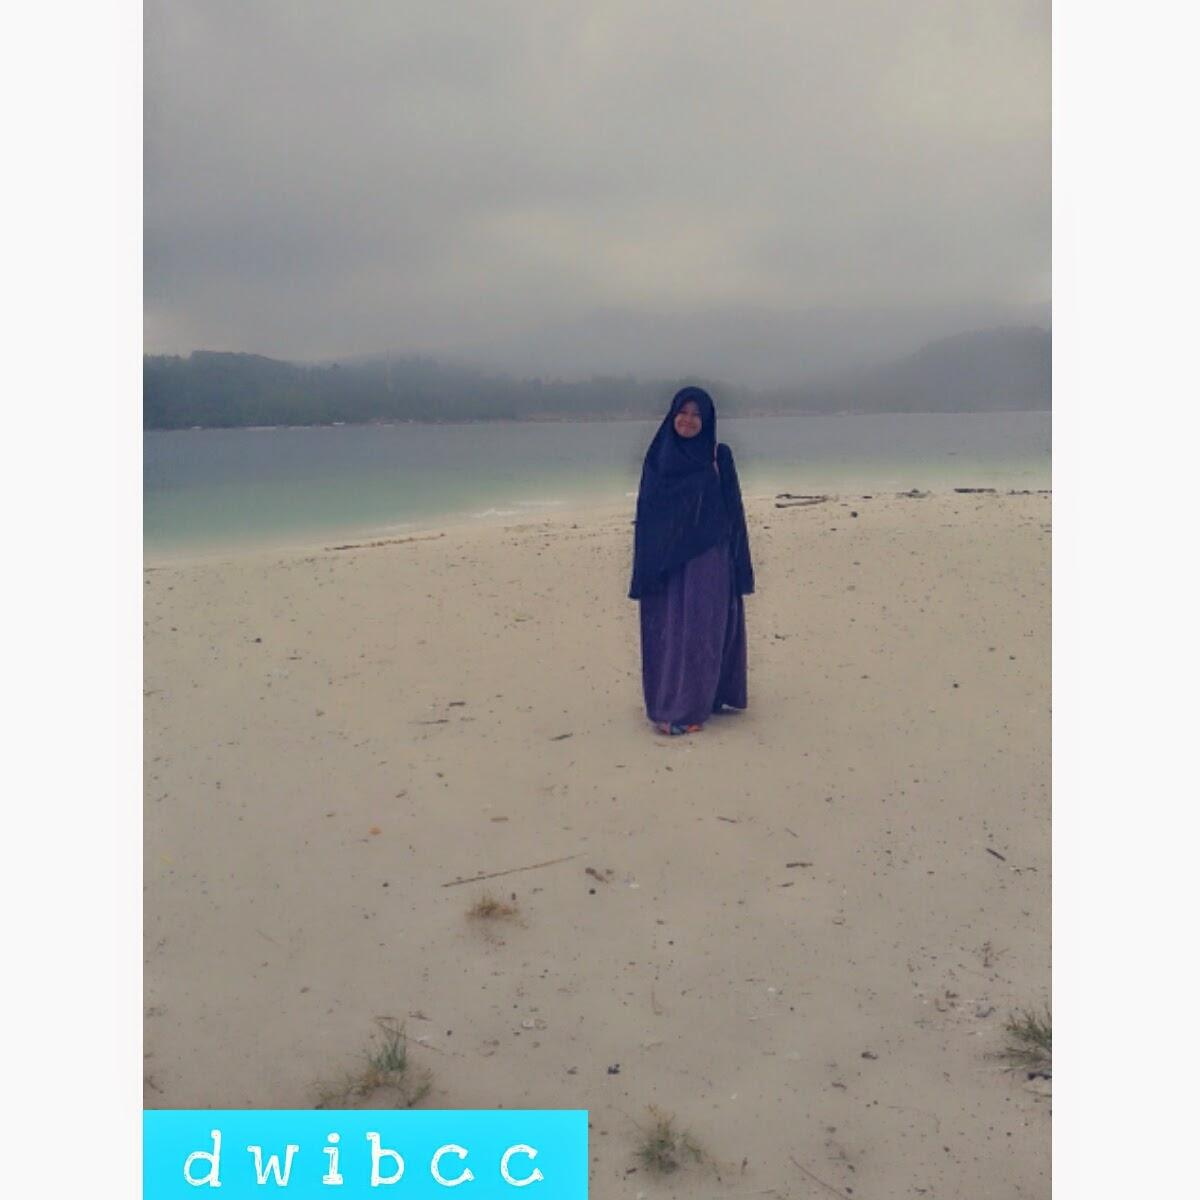 dwibcc foto muslimah dipantai pake hijab syar'i